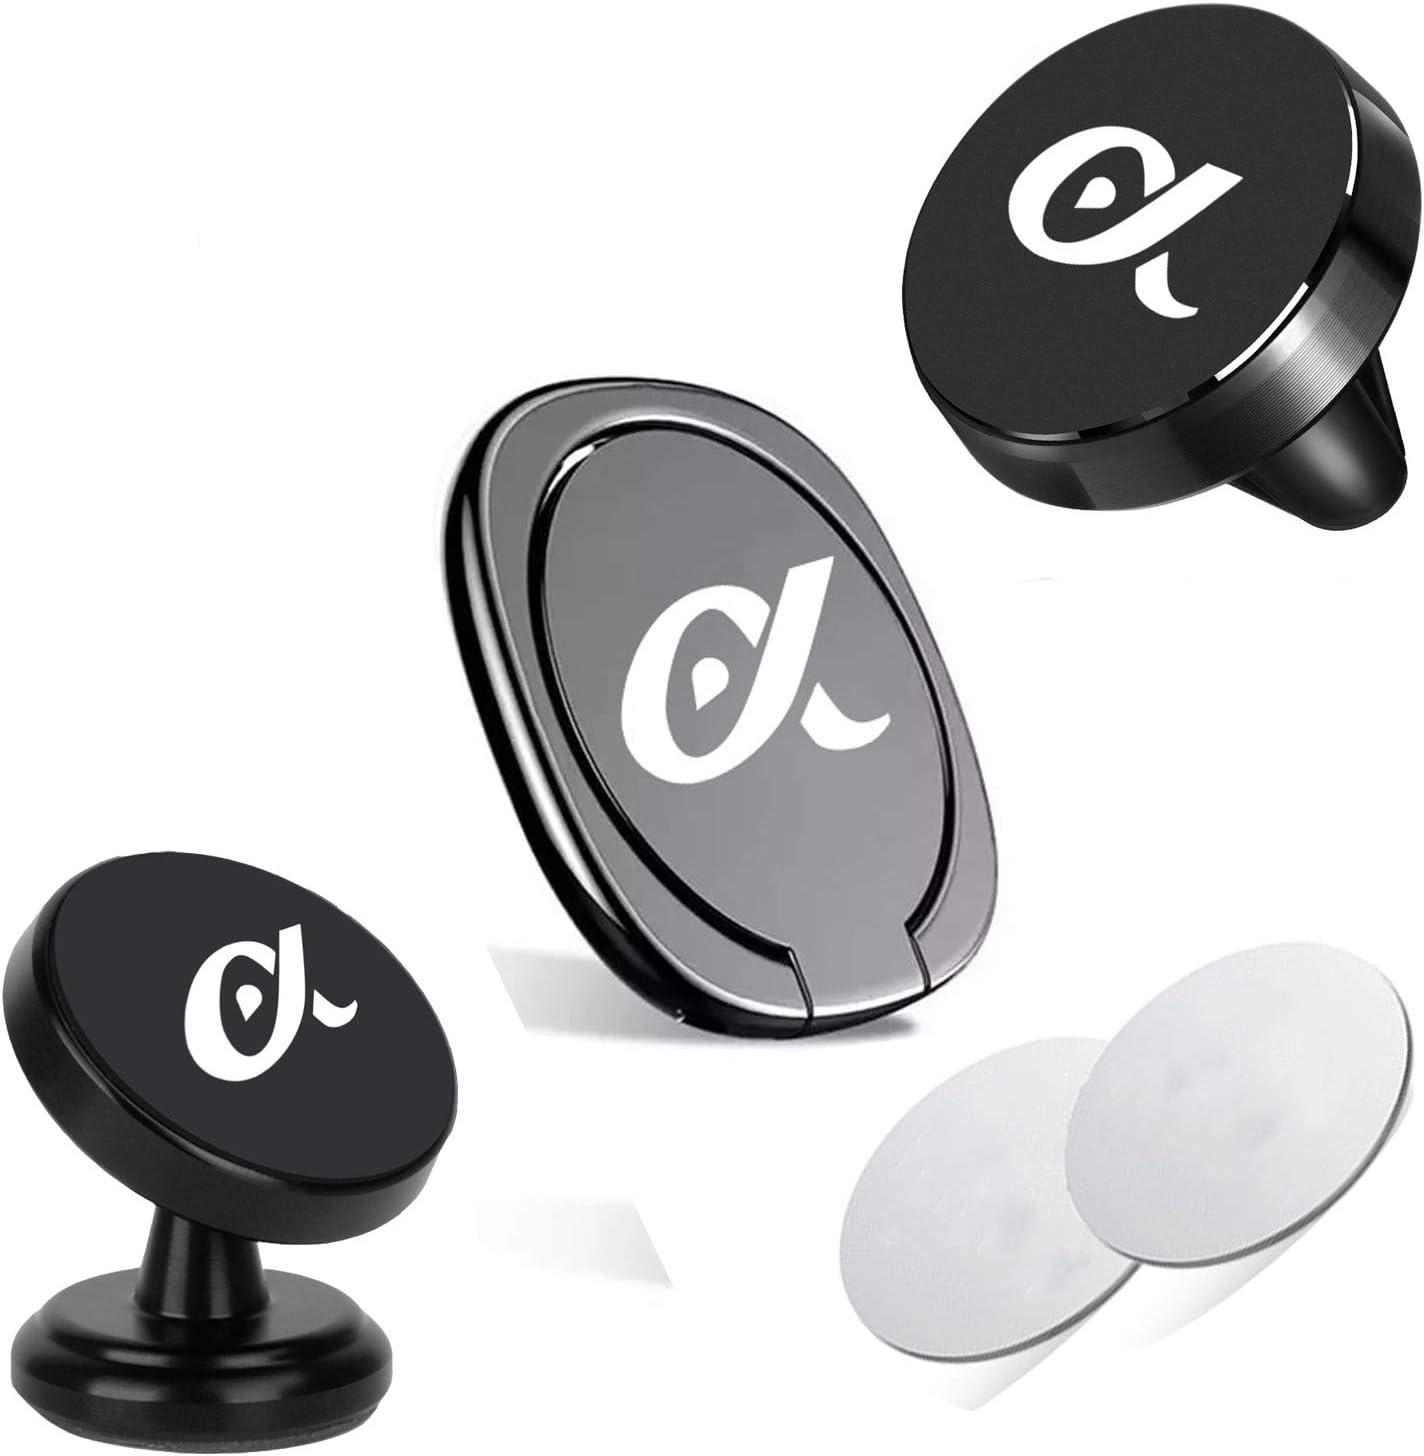 Finger Ring Holder 360 Rotation for Smartphone Dashboard CAR Phone Mount Holder 360 Rotation Magnetic CAR Phone Mount Holders Vent CAR Phone Mount Holder